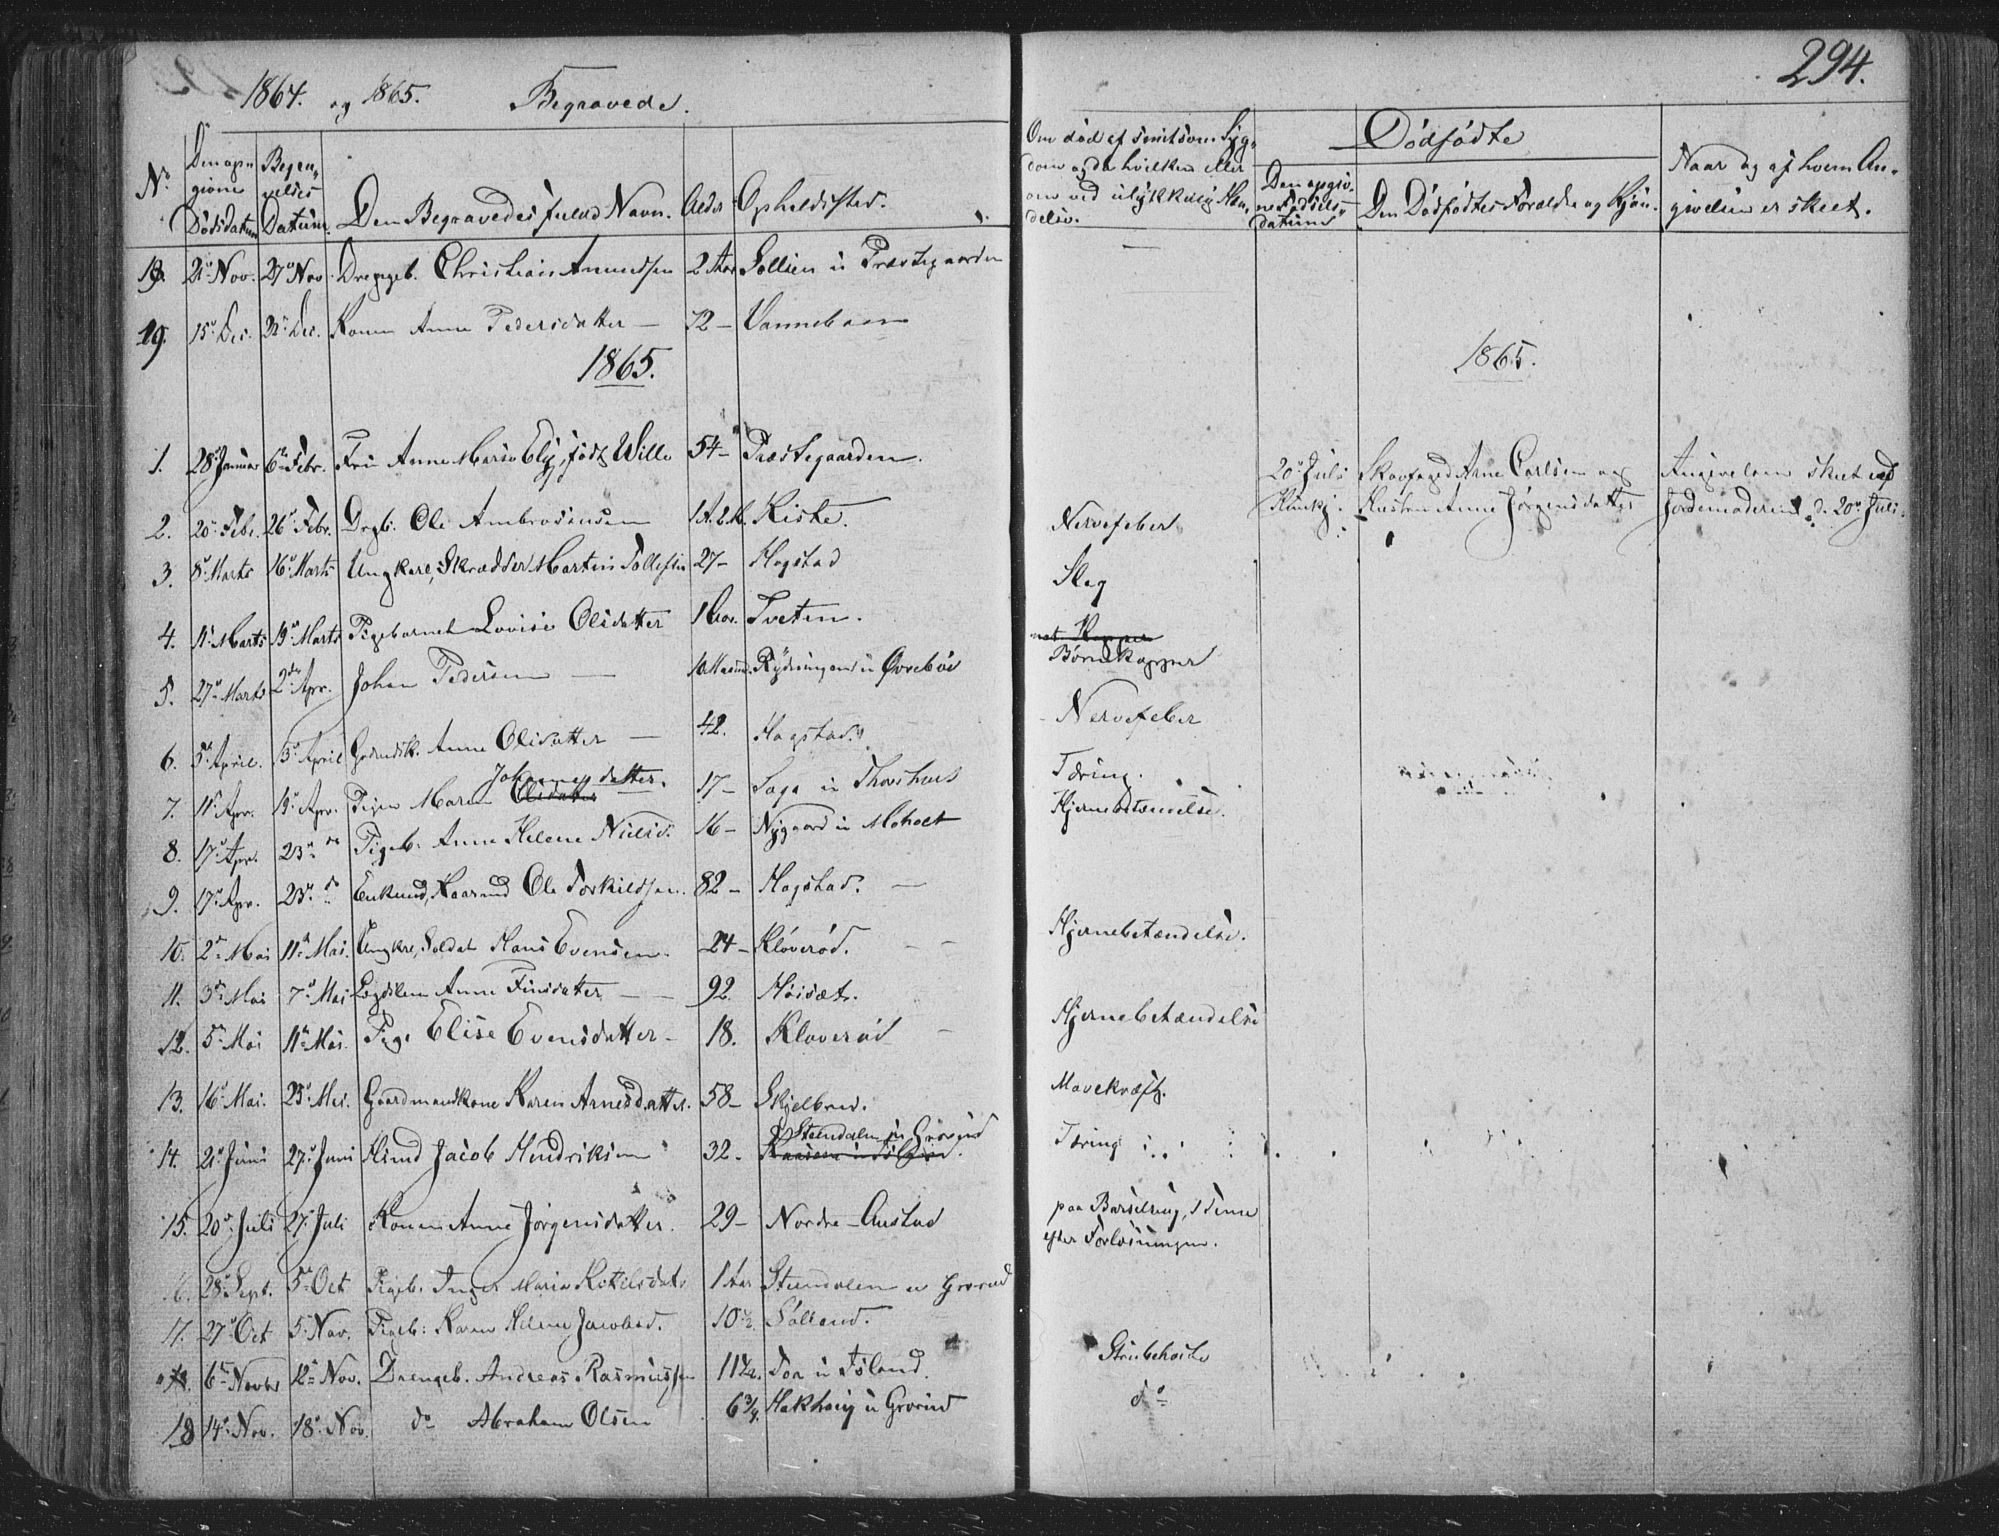 SAKO, Siljan kirkebøker, F/Fa/L0001: Parish register (official) no. 1, 1831-1870, p. 294